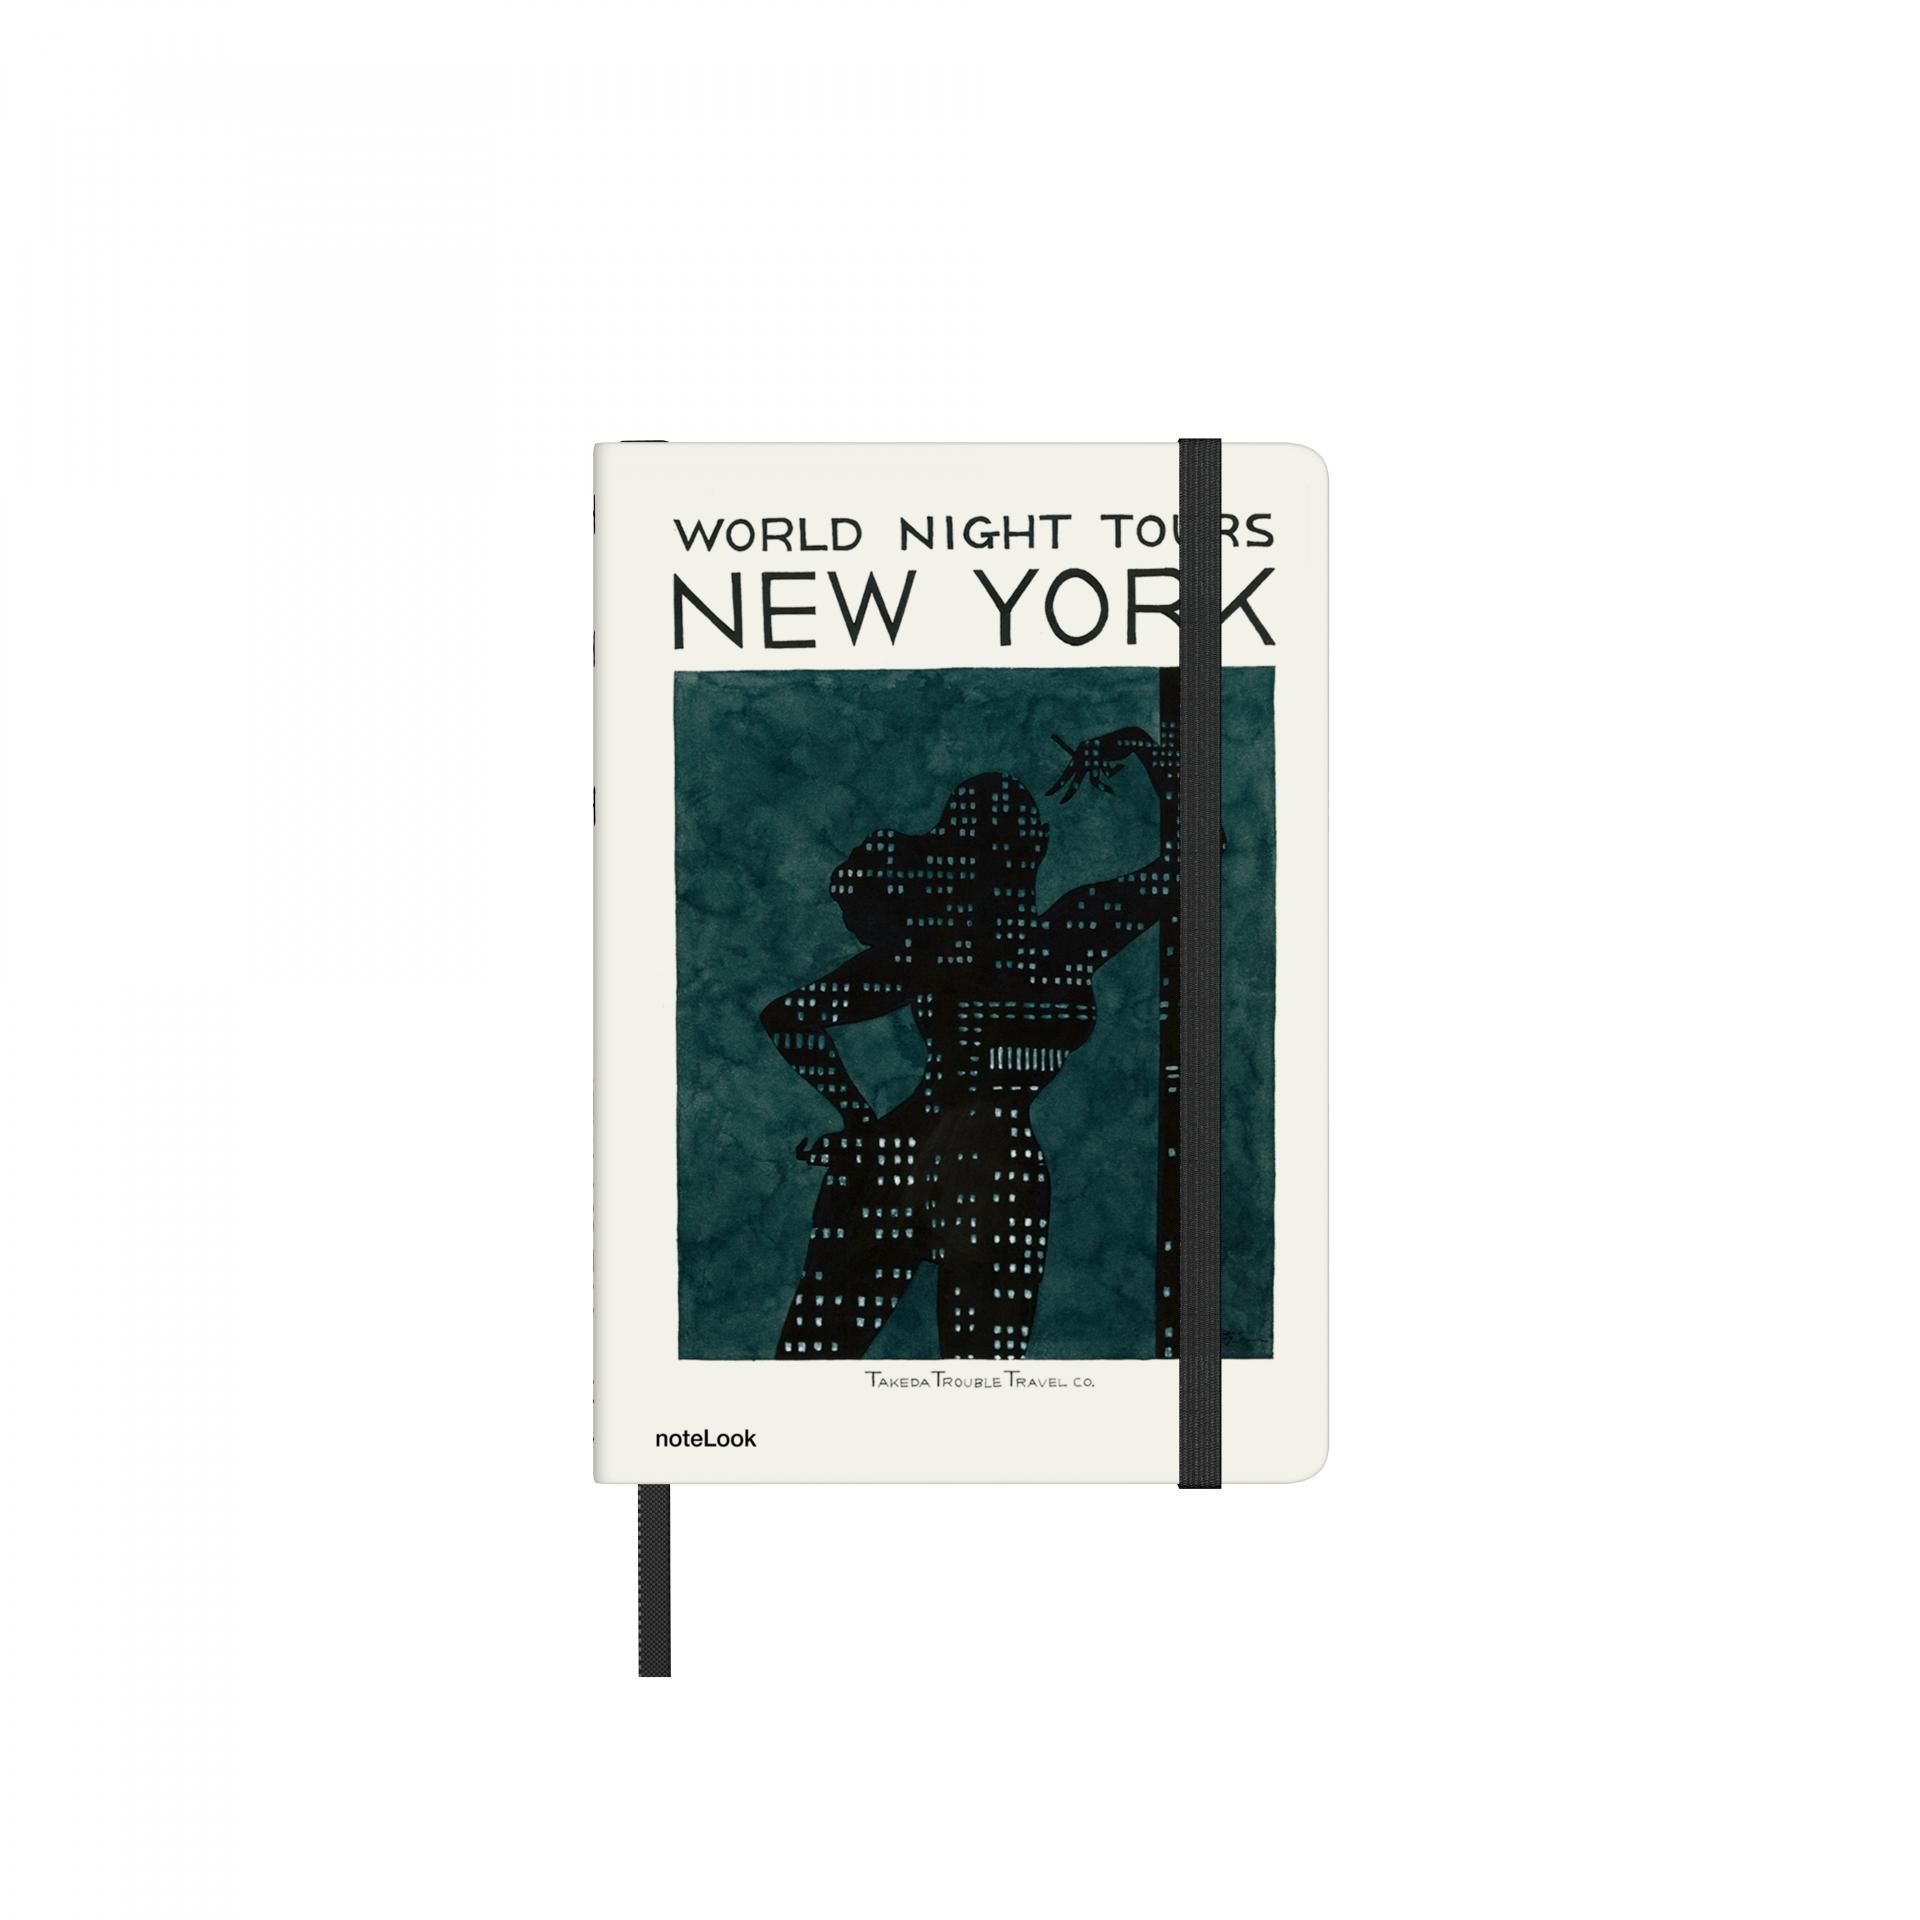 Бележник Scrikss Notelook Notebook Takeda New York Striped, модел 77259,   A6